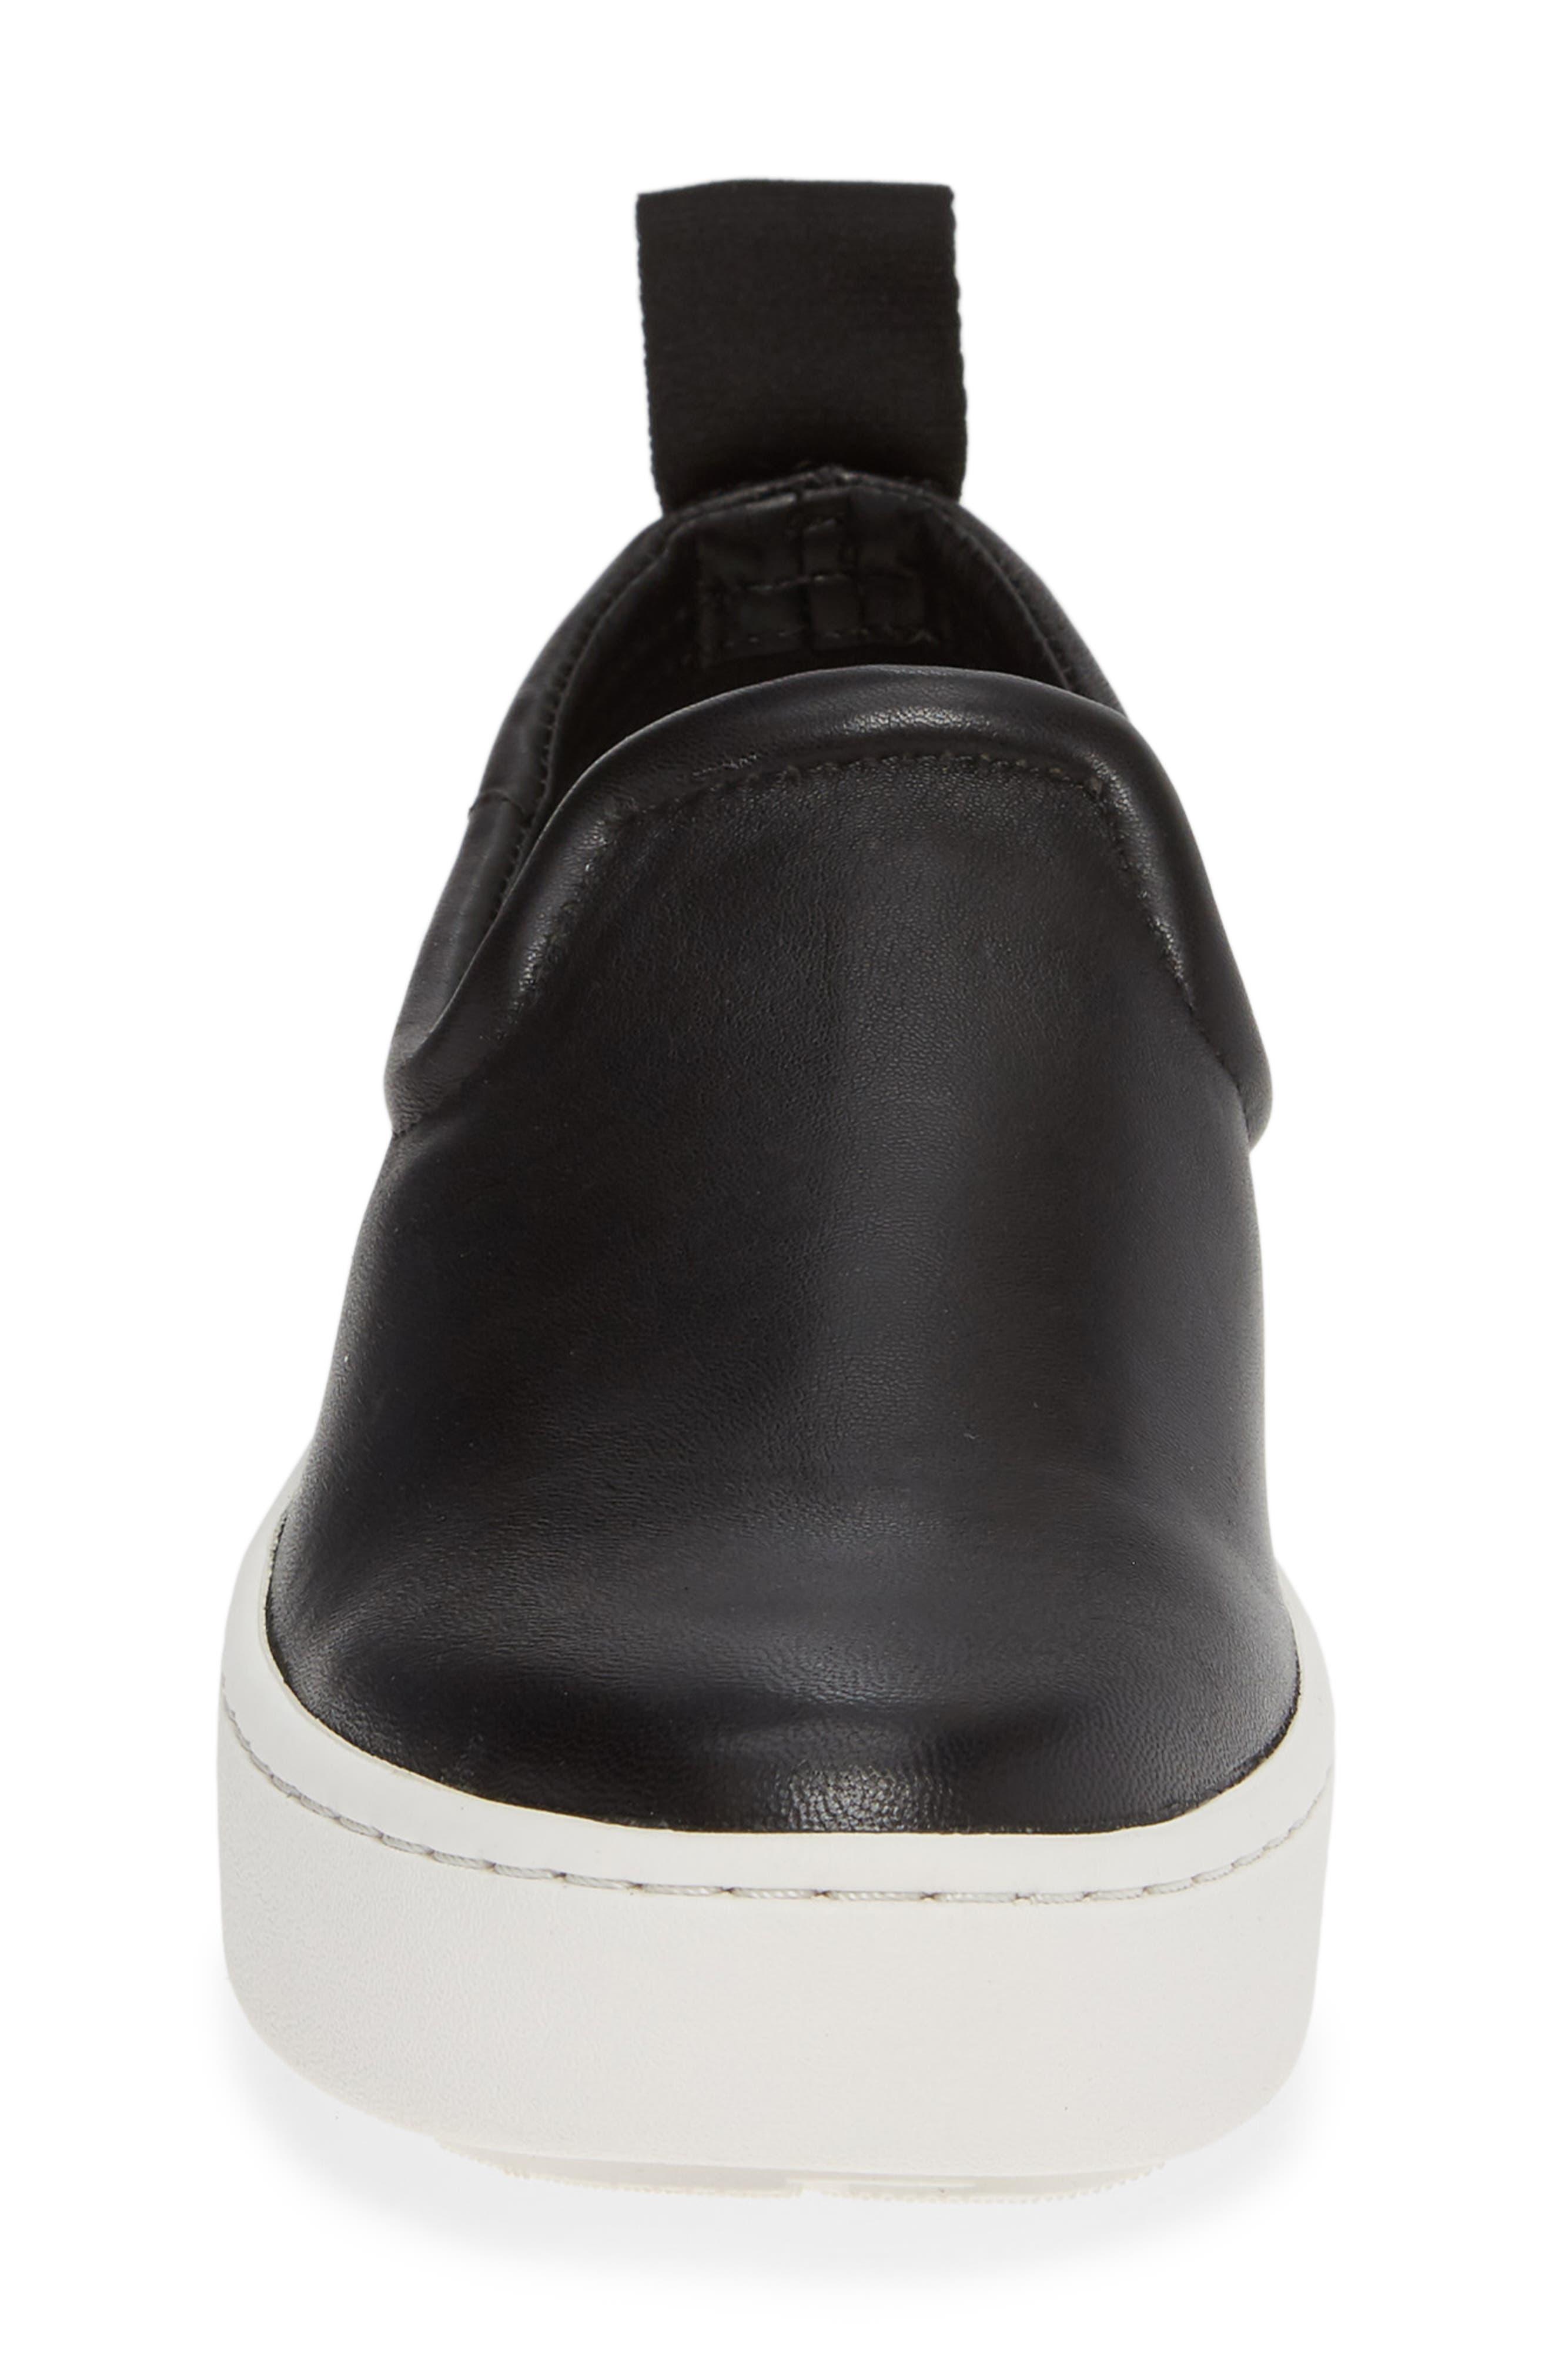 DOLCE VITA, Tag Slip-On Sneaker, Alternate thumbnail 4, color, BLACK LEATHER